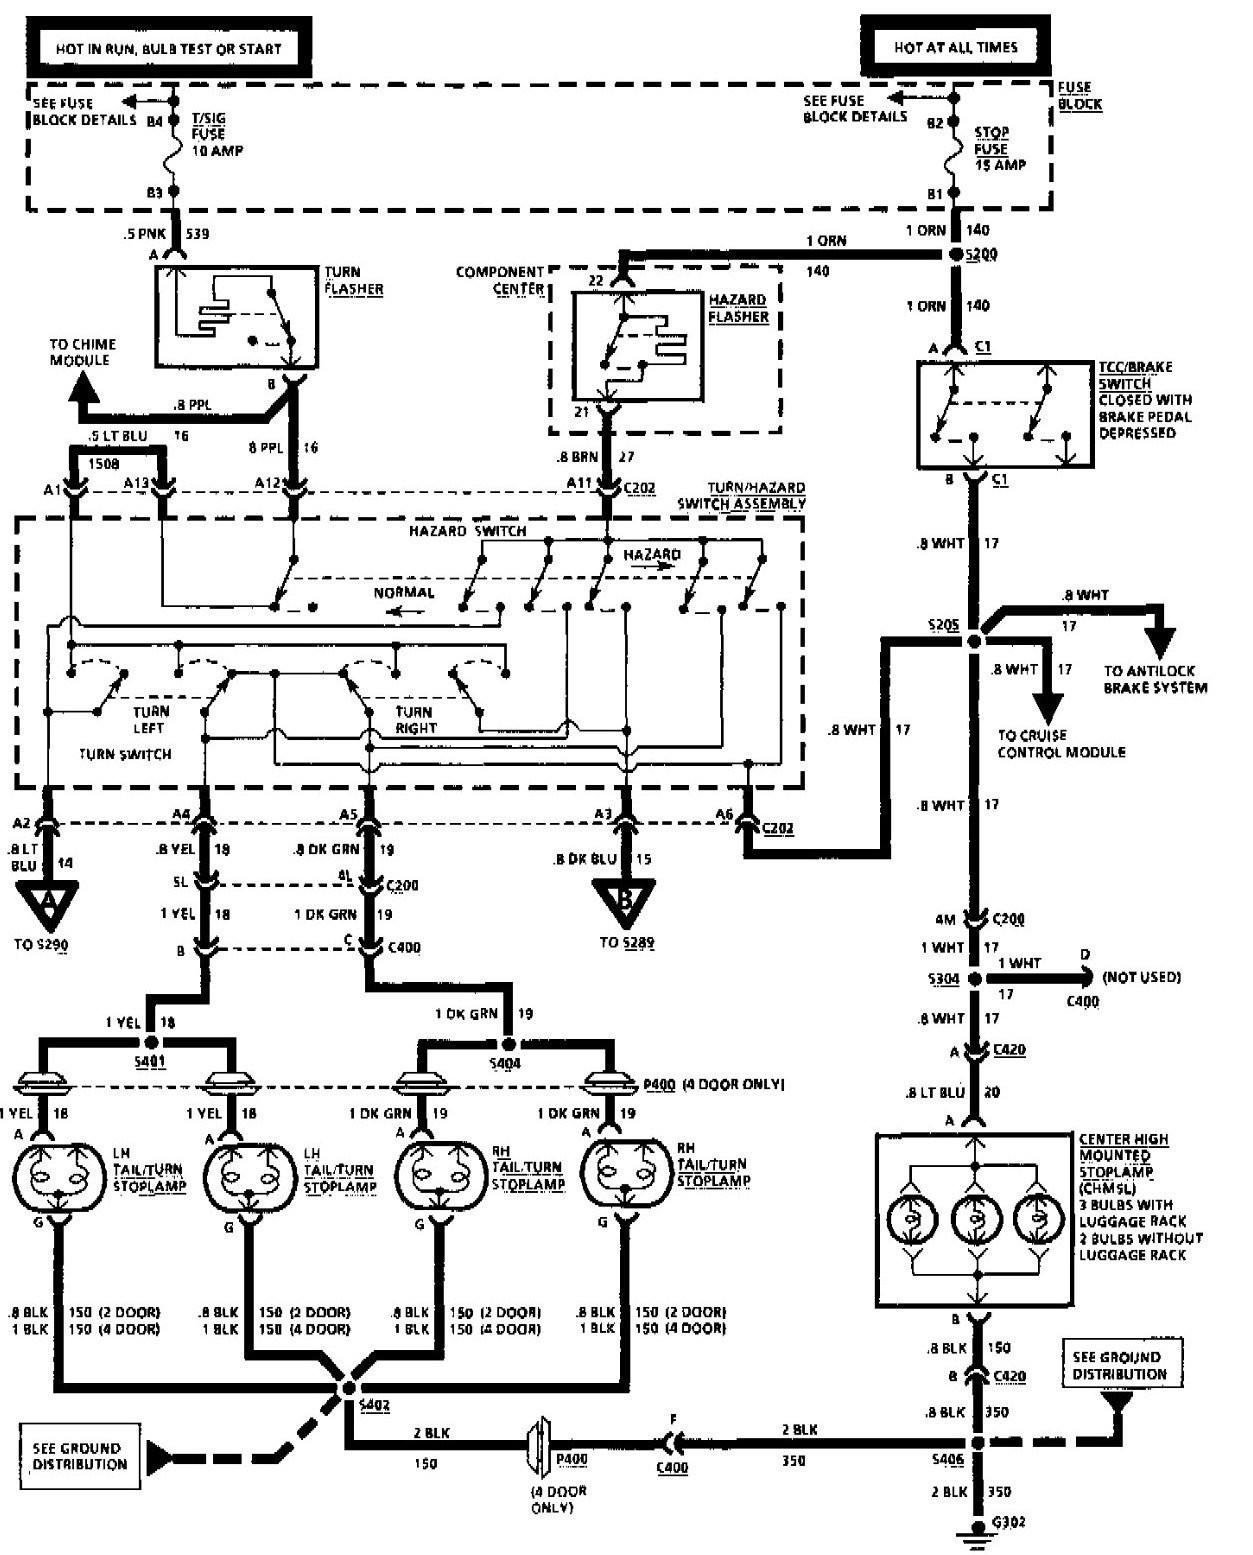 Weg Electric Motor Wiring Diagram Inspirational Weg 12 Lead Motor - 12 Lead Motor Wiring Diagram